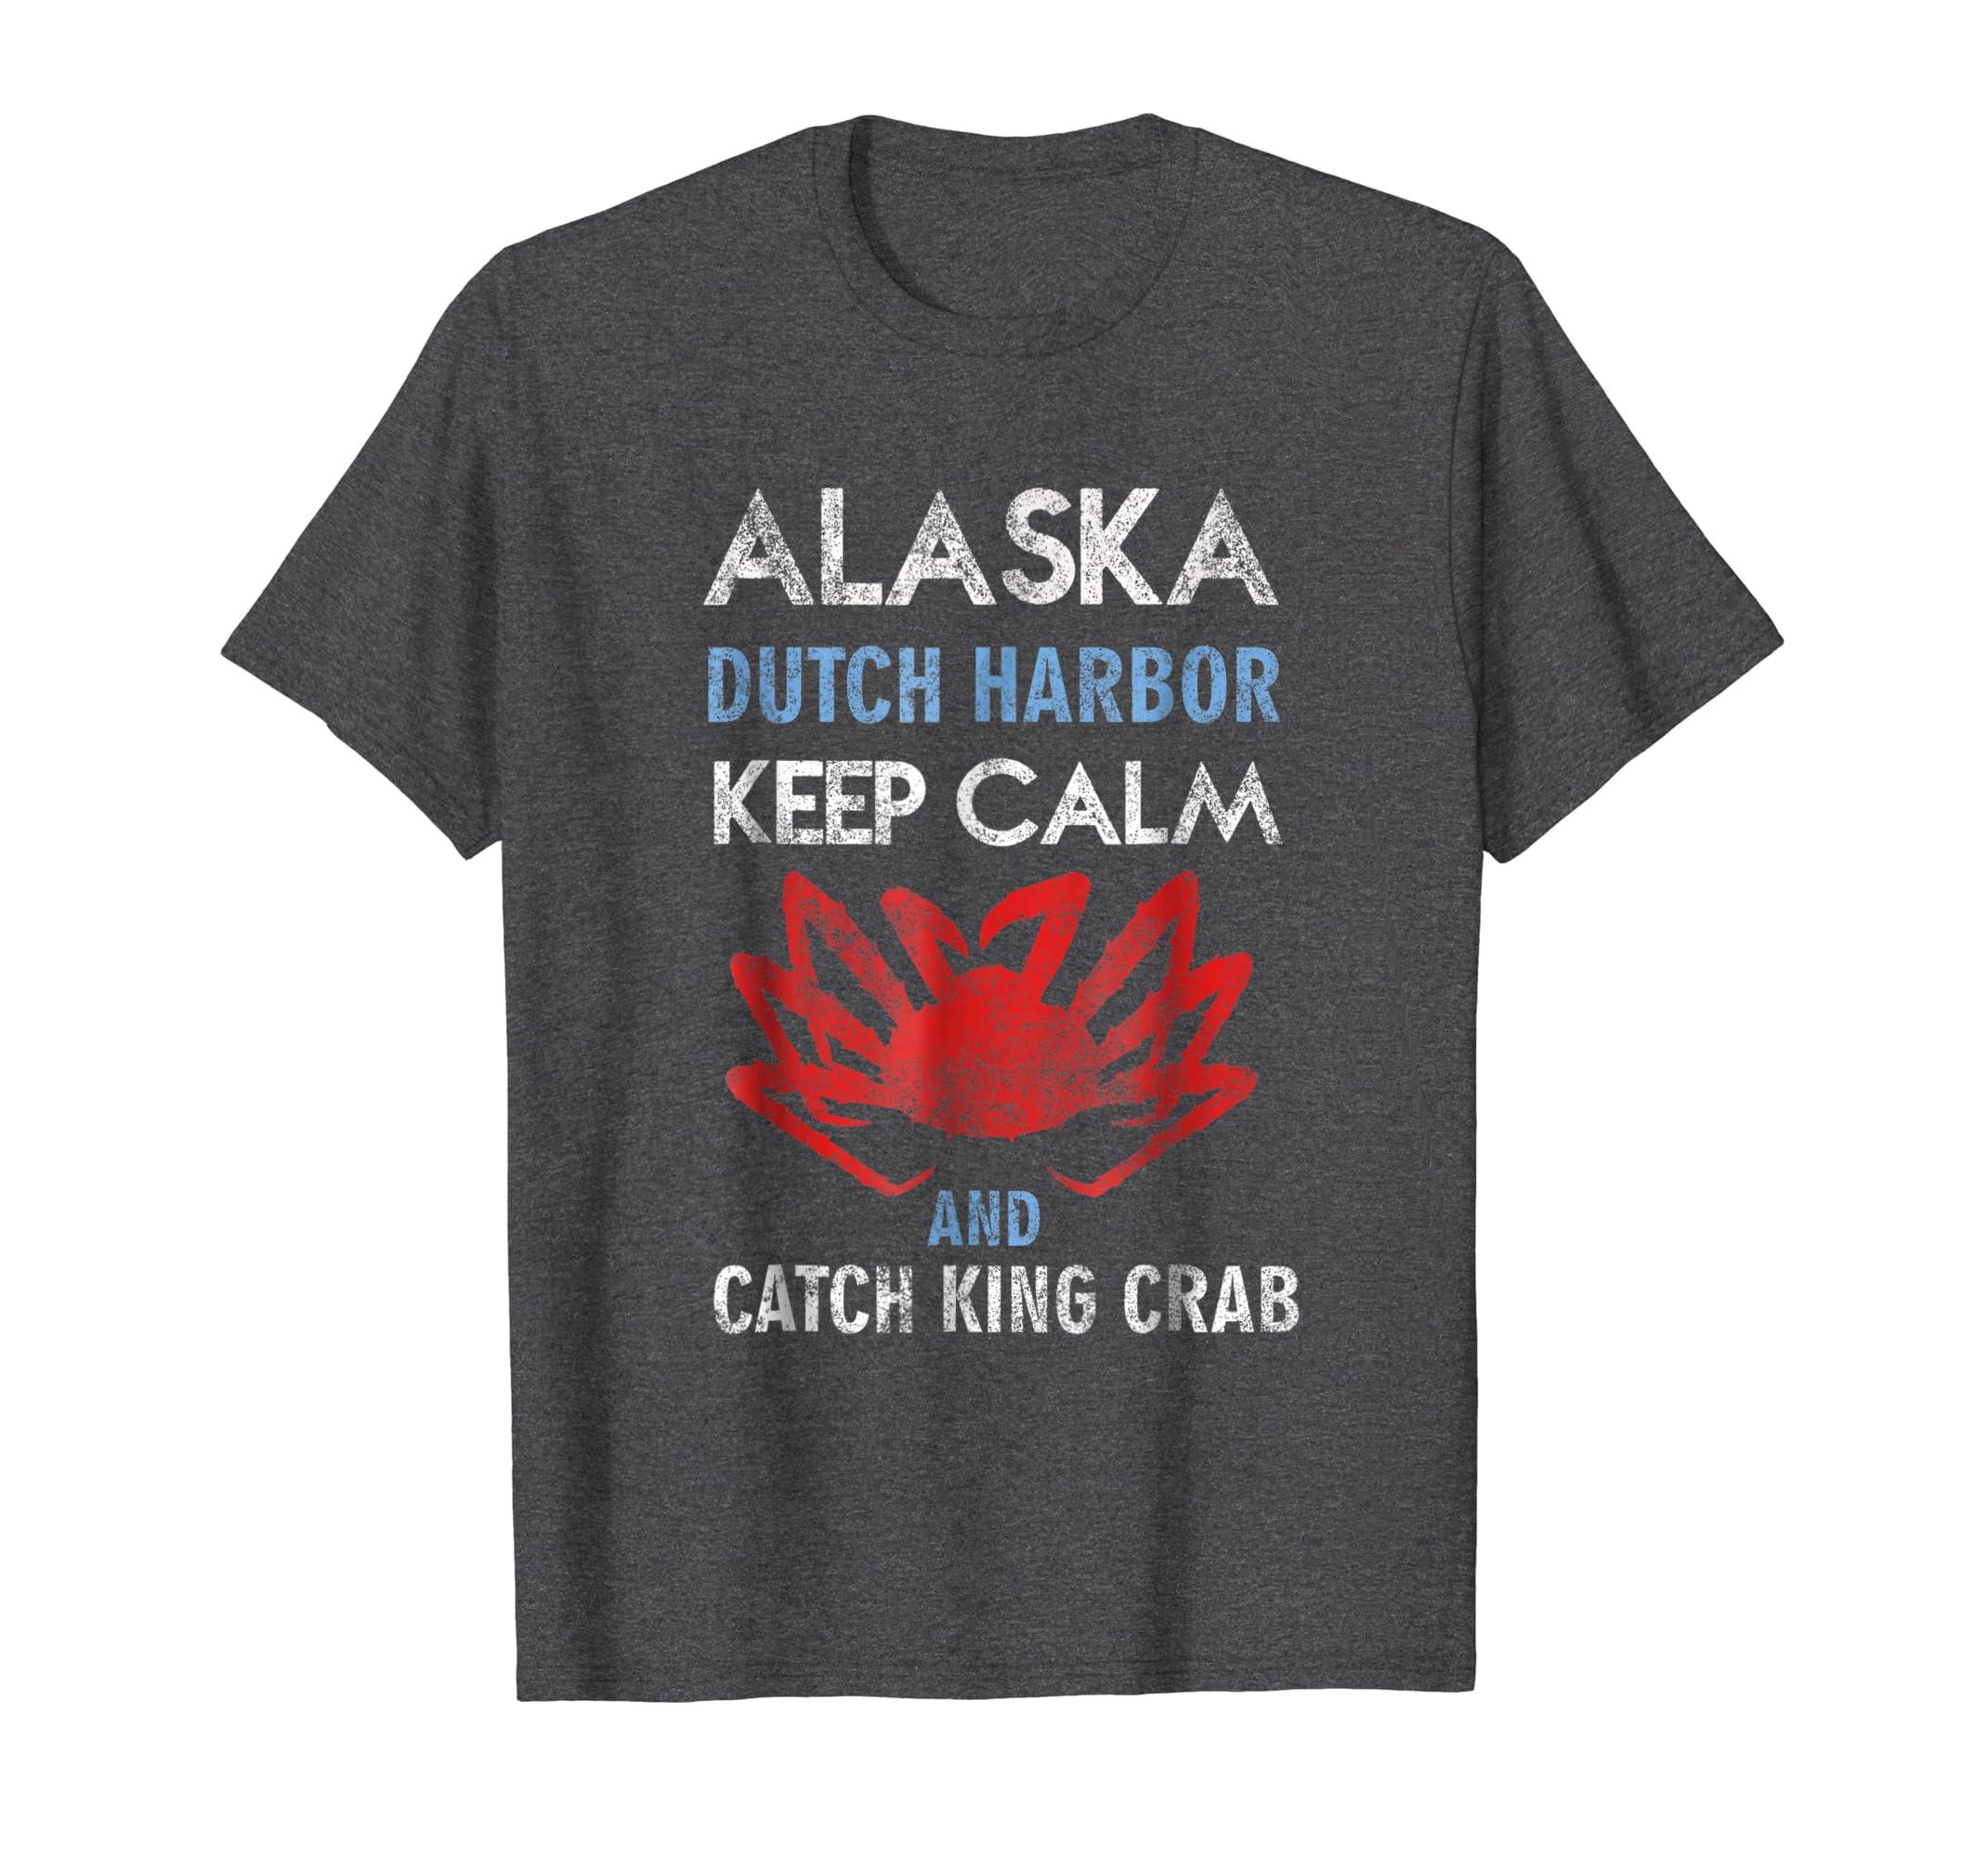 Alaska Dutch Harbor Keep Calm and Catch King Crab T Shirt-Awarplus